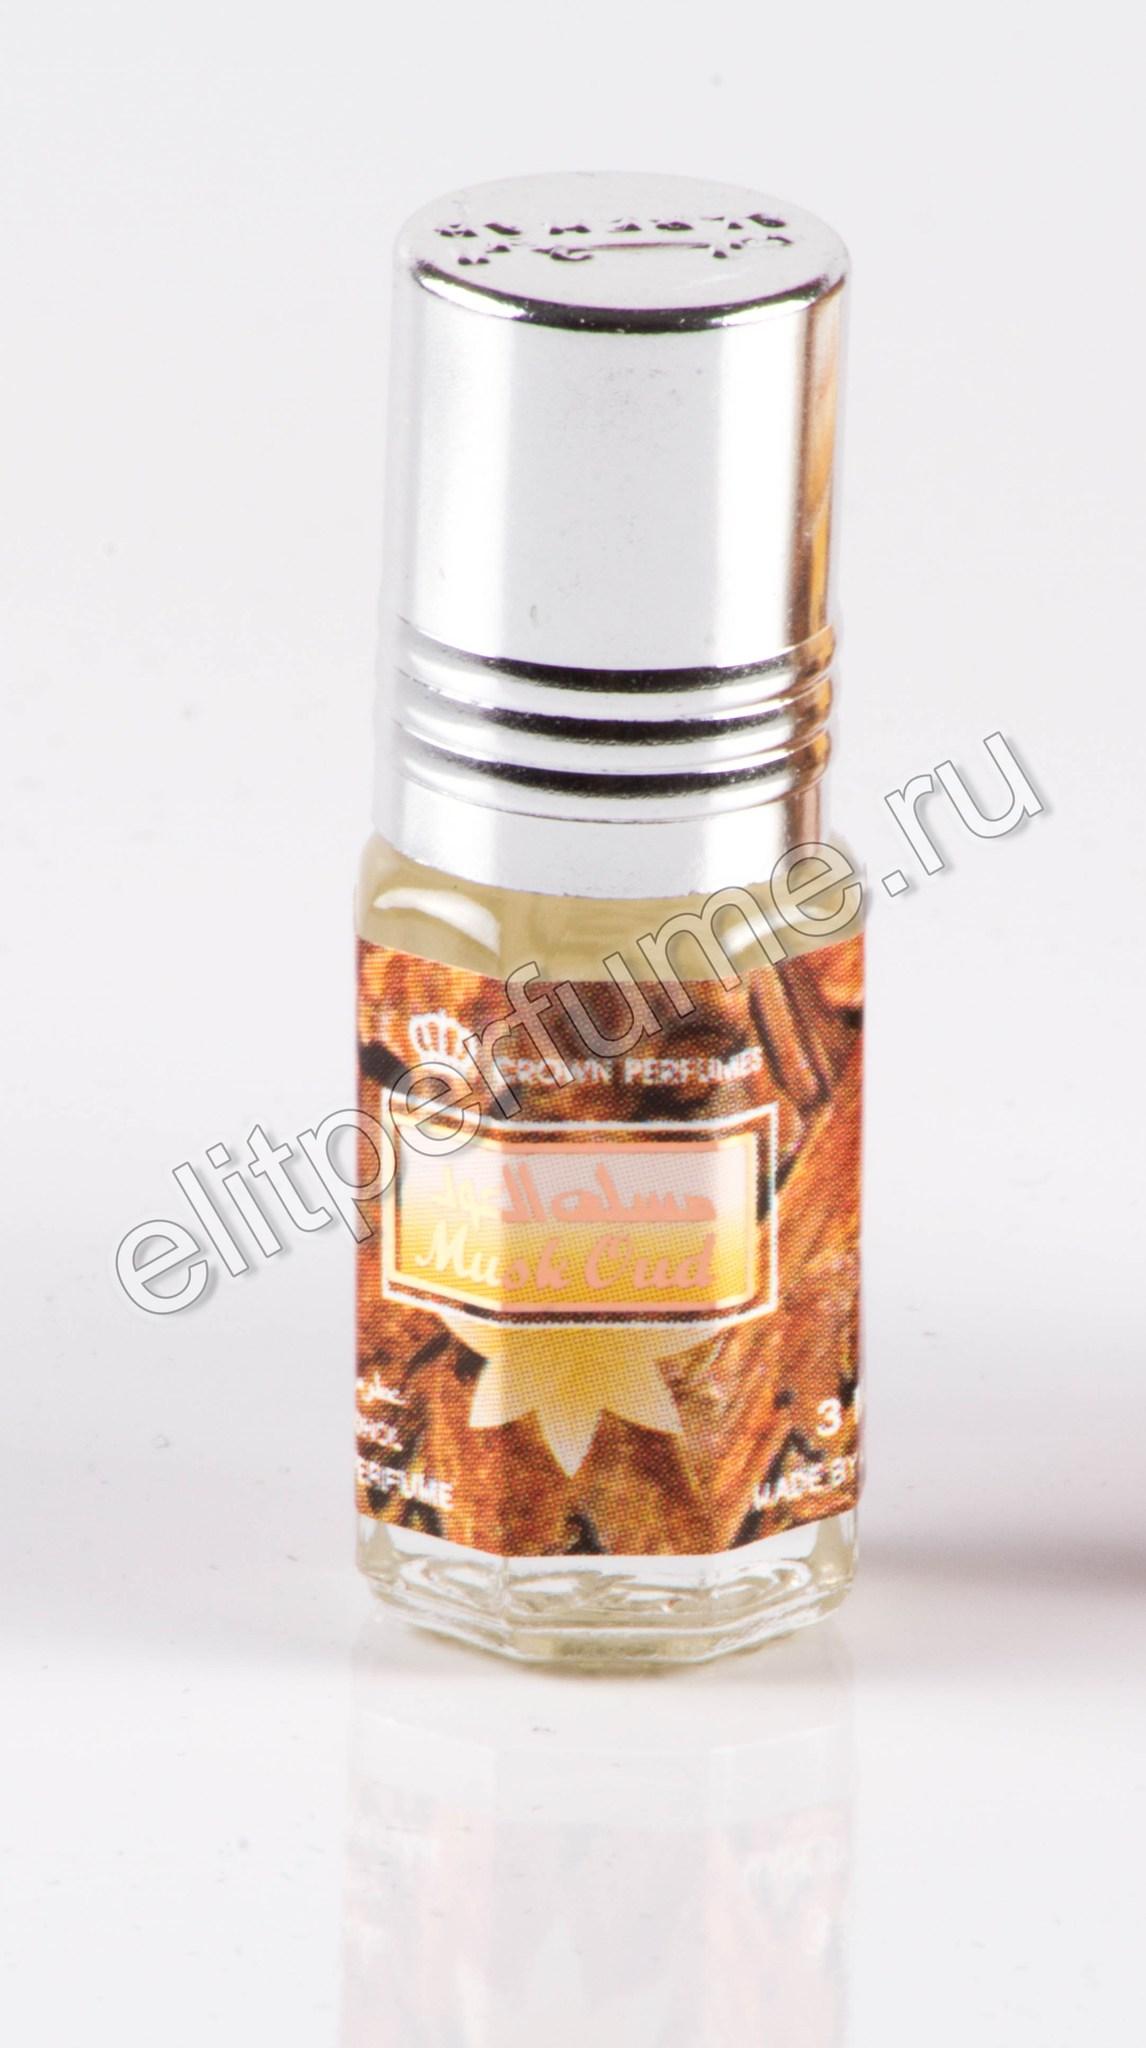 Musk al Oud Муск аль Уд 3мл арабские масляные духи от Аль Рехаб Al Rehab